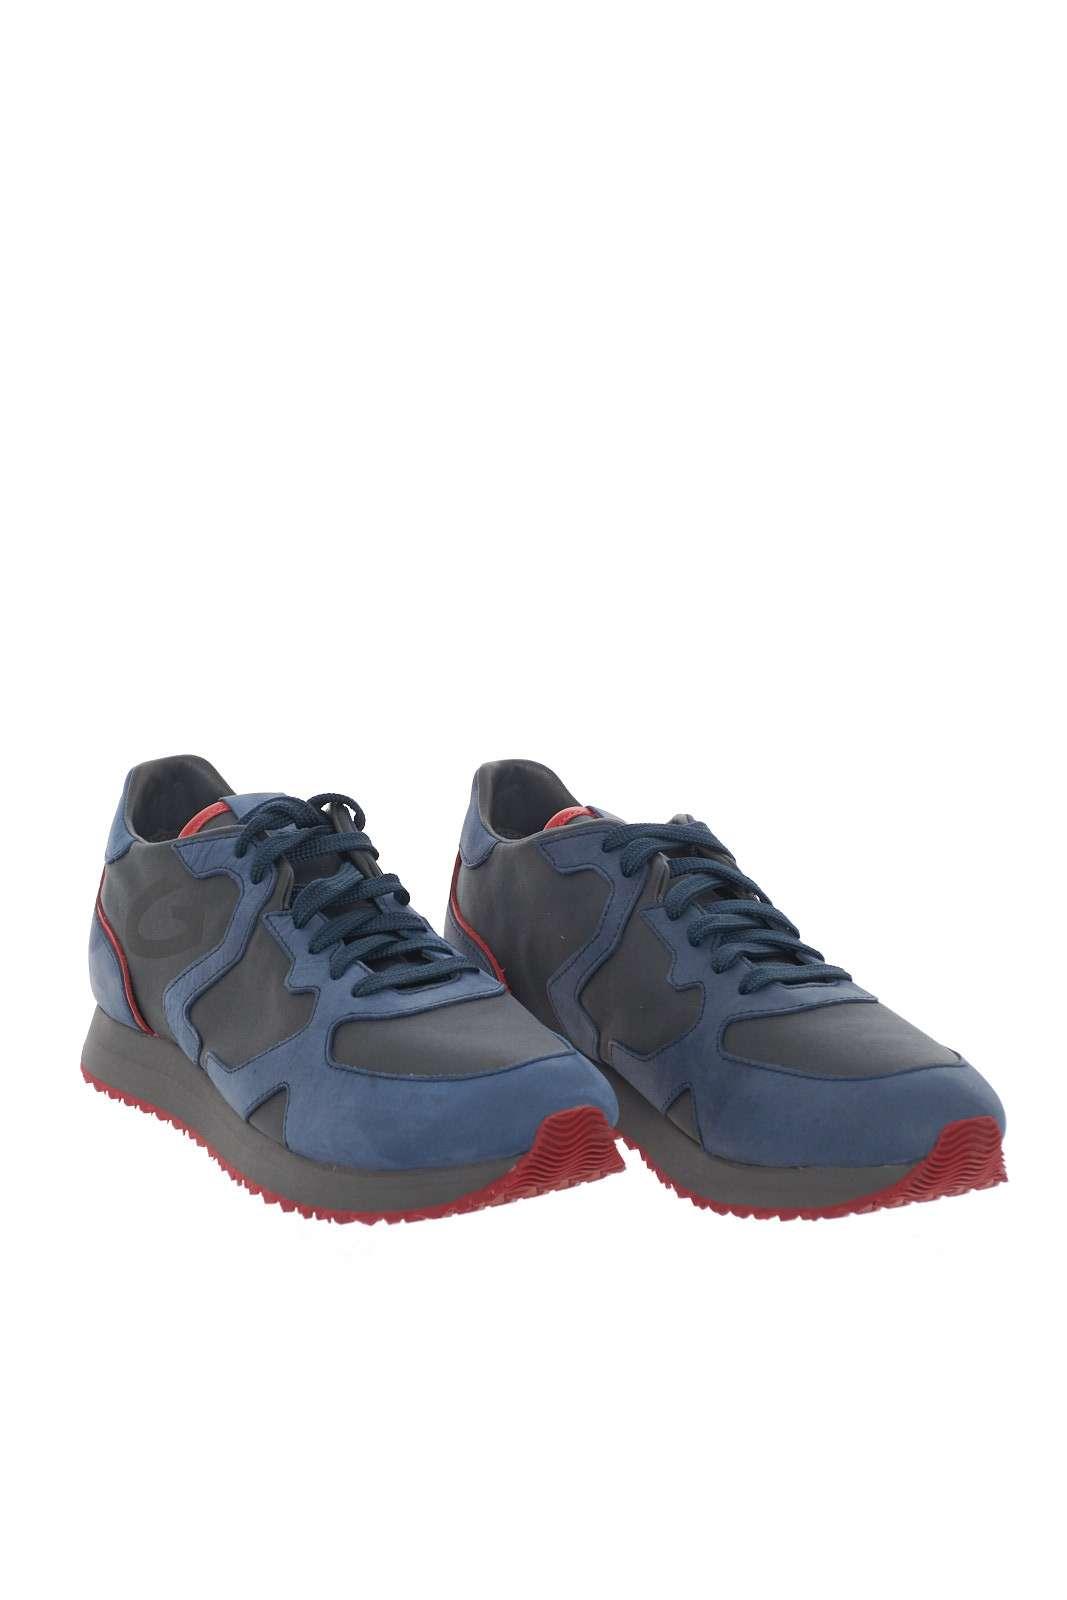 https://www.parmax.com/media/catalog/product/a/i/AI-outlet_parmax-scarpe-uomo-Guardiani-Sport-SU71391C-B.jpg